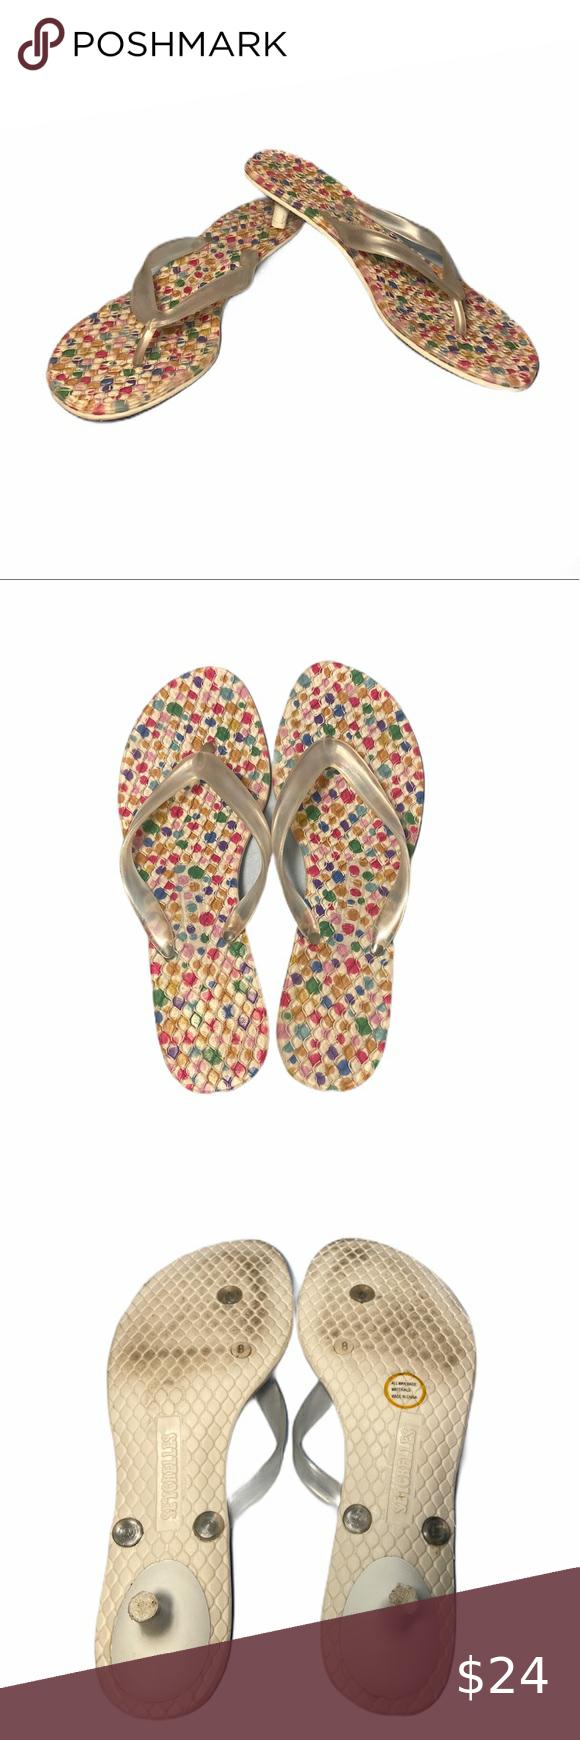 Seychelles Kitten Heel Flip Flop In 2020 Heeled Flip Flops Shoes Women Heels High Heel Flip Flops